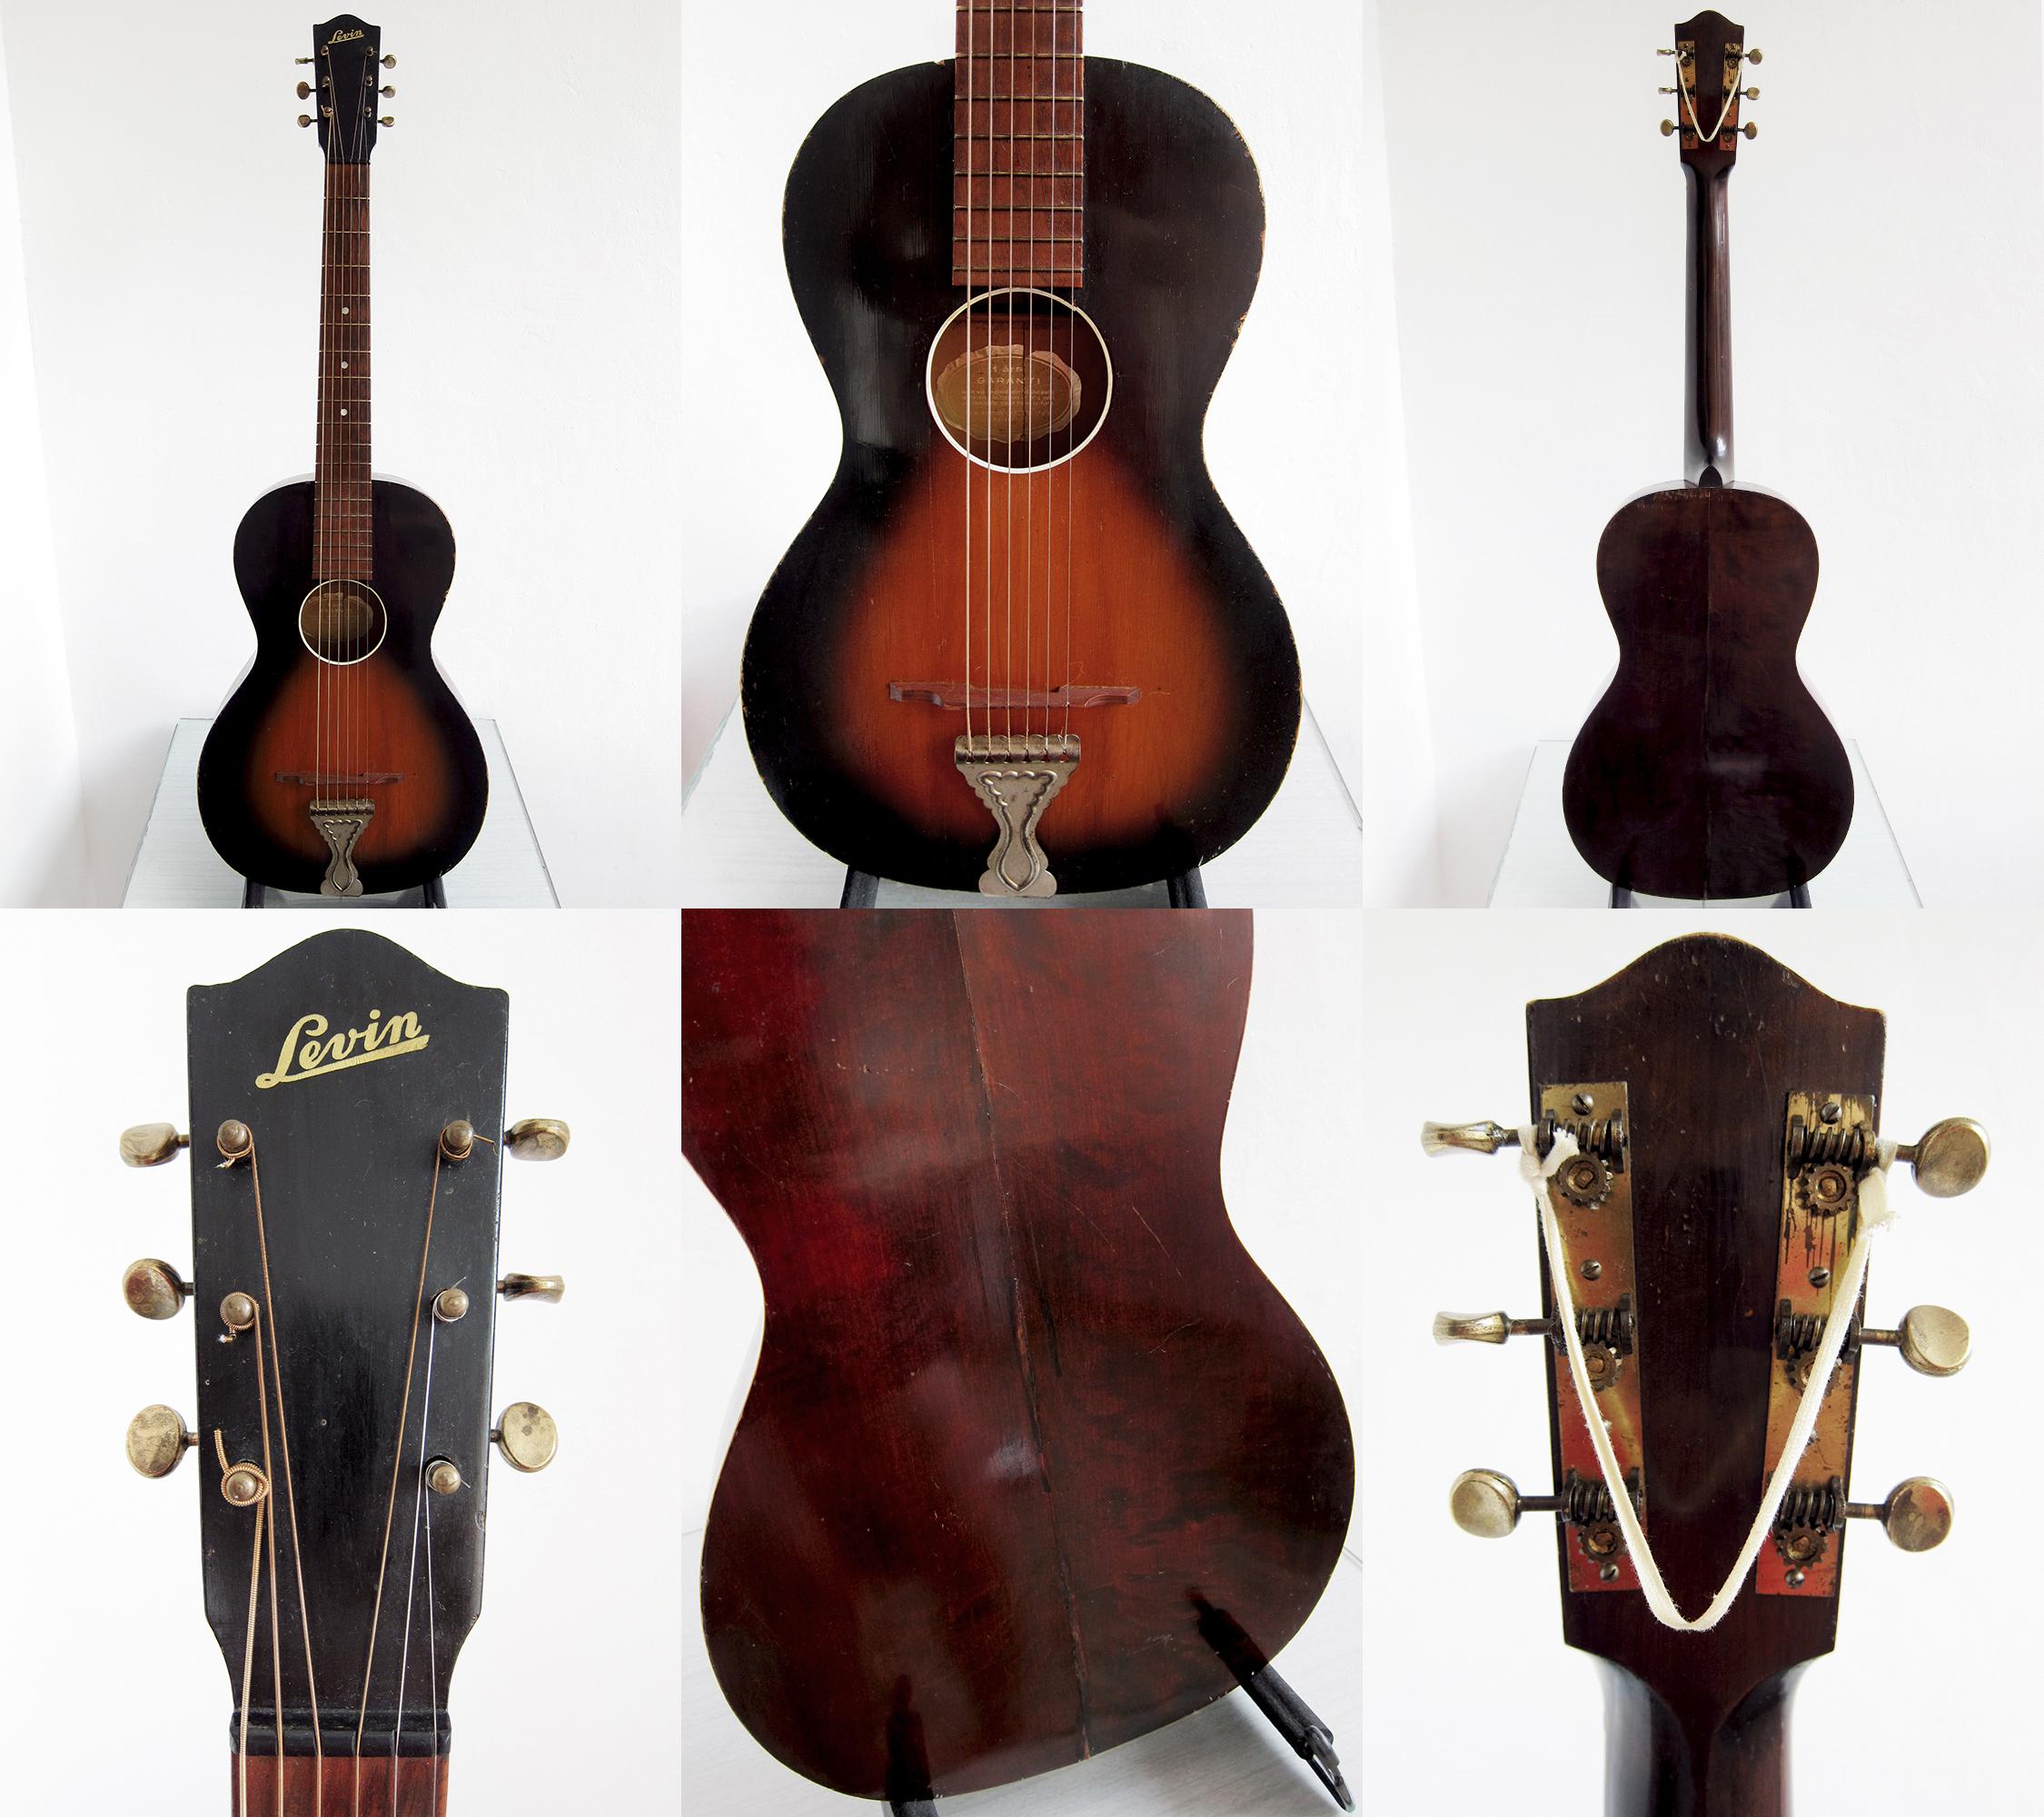 Levin Model 65 parlour guitar Made in Sweden 1942